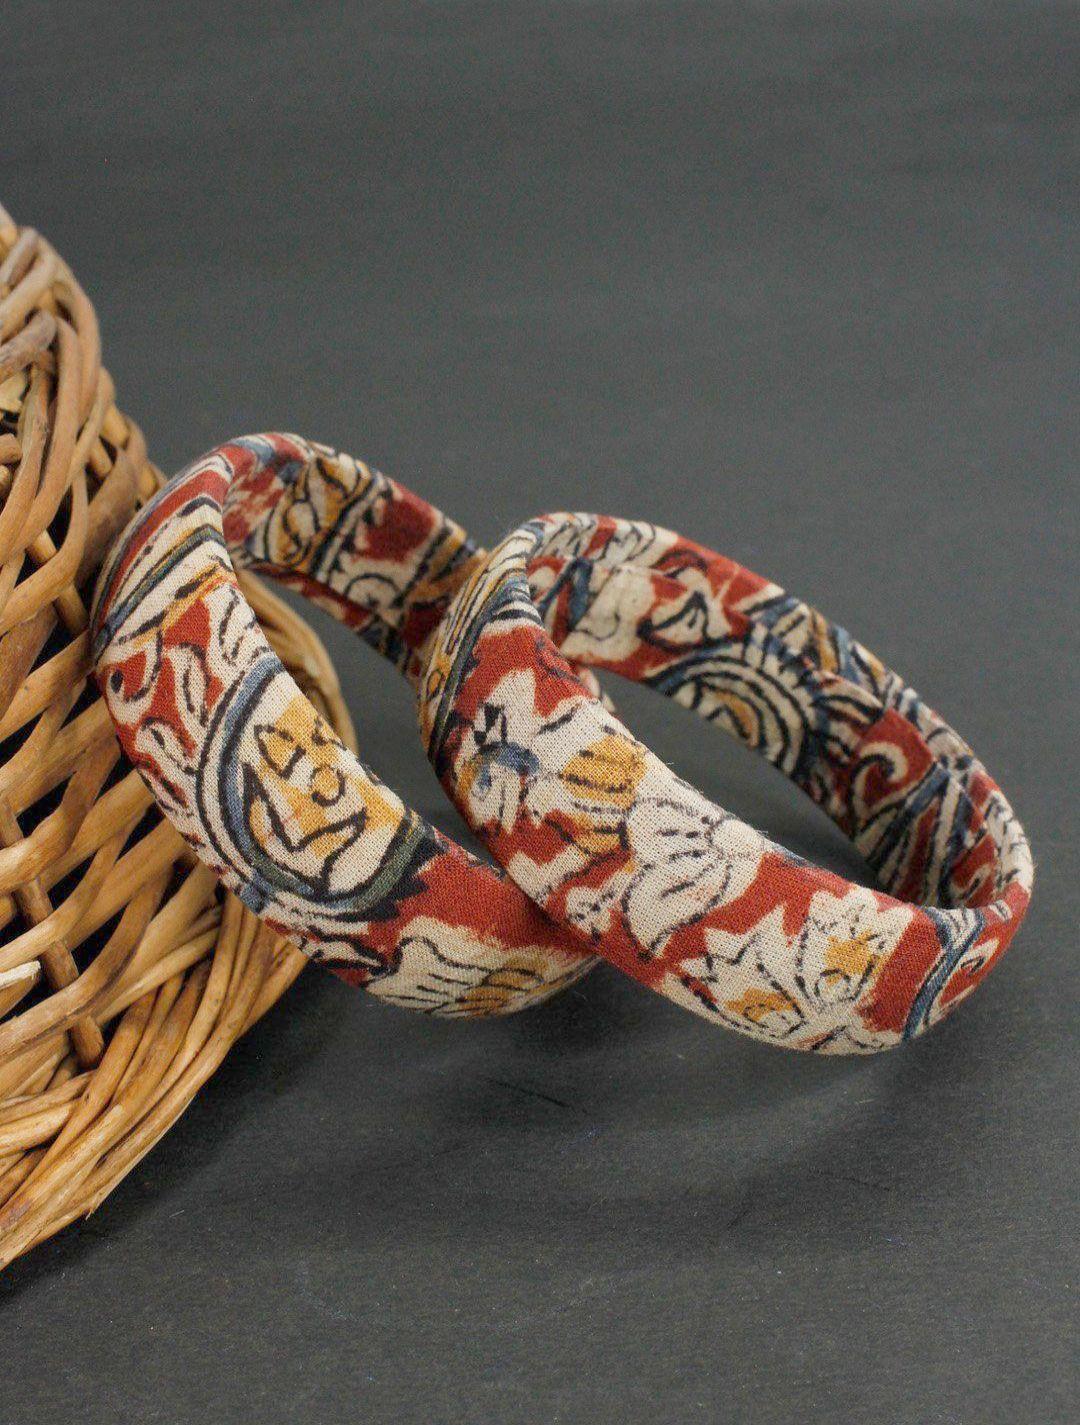 Jewellery Shops Cheltenham but Jewellery Shops Online